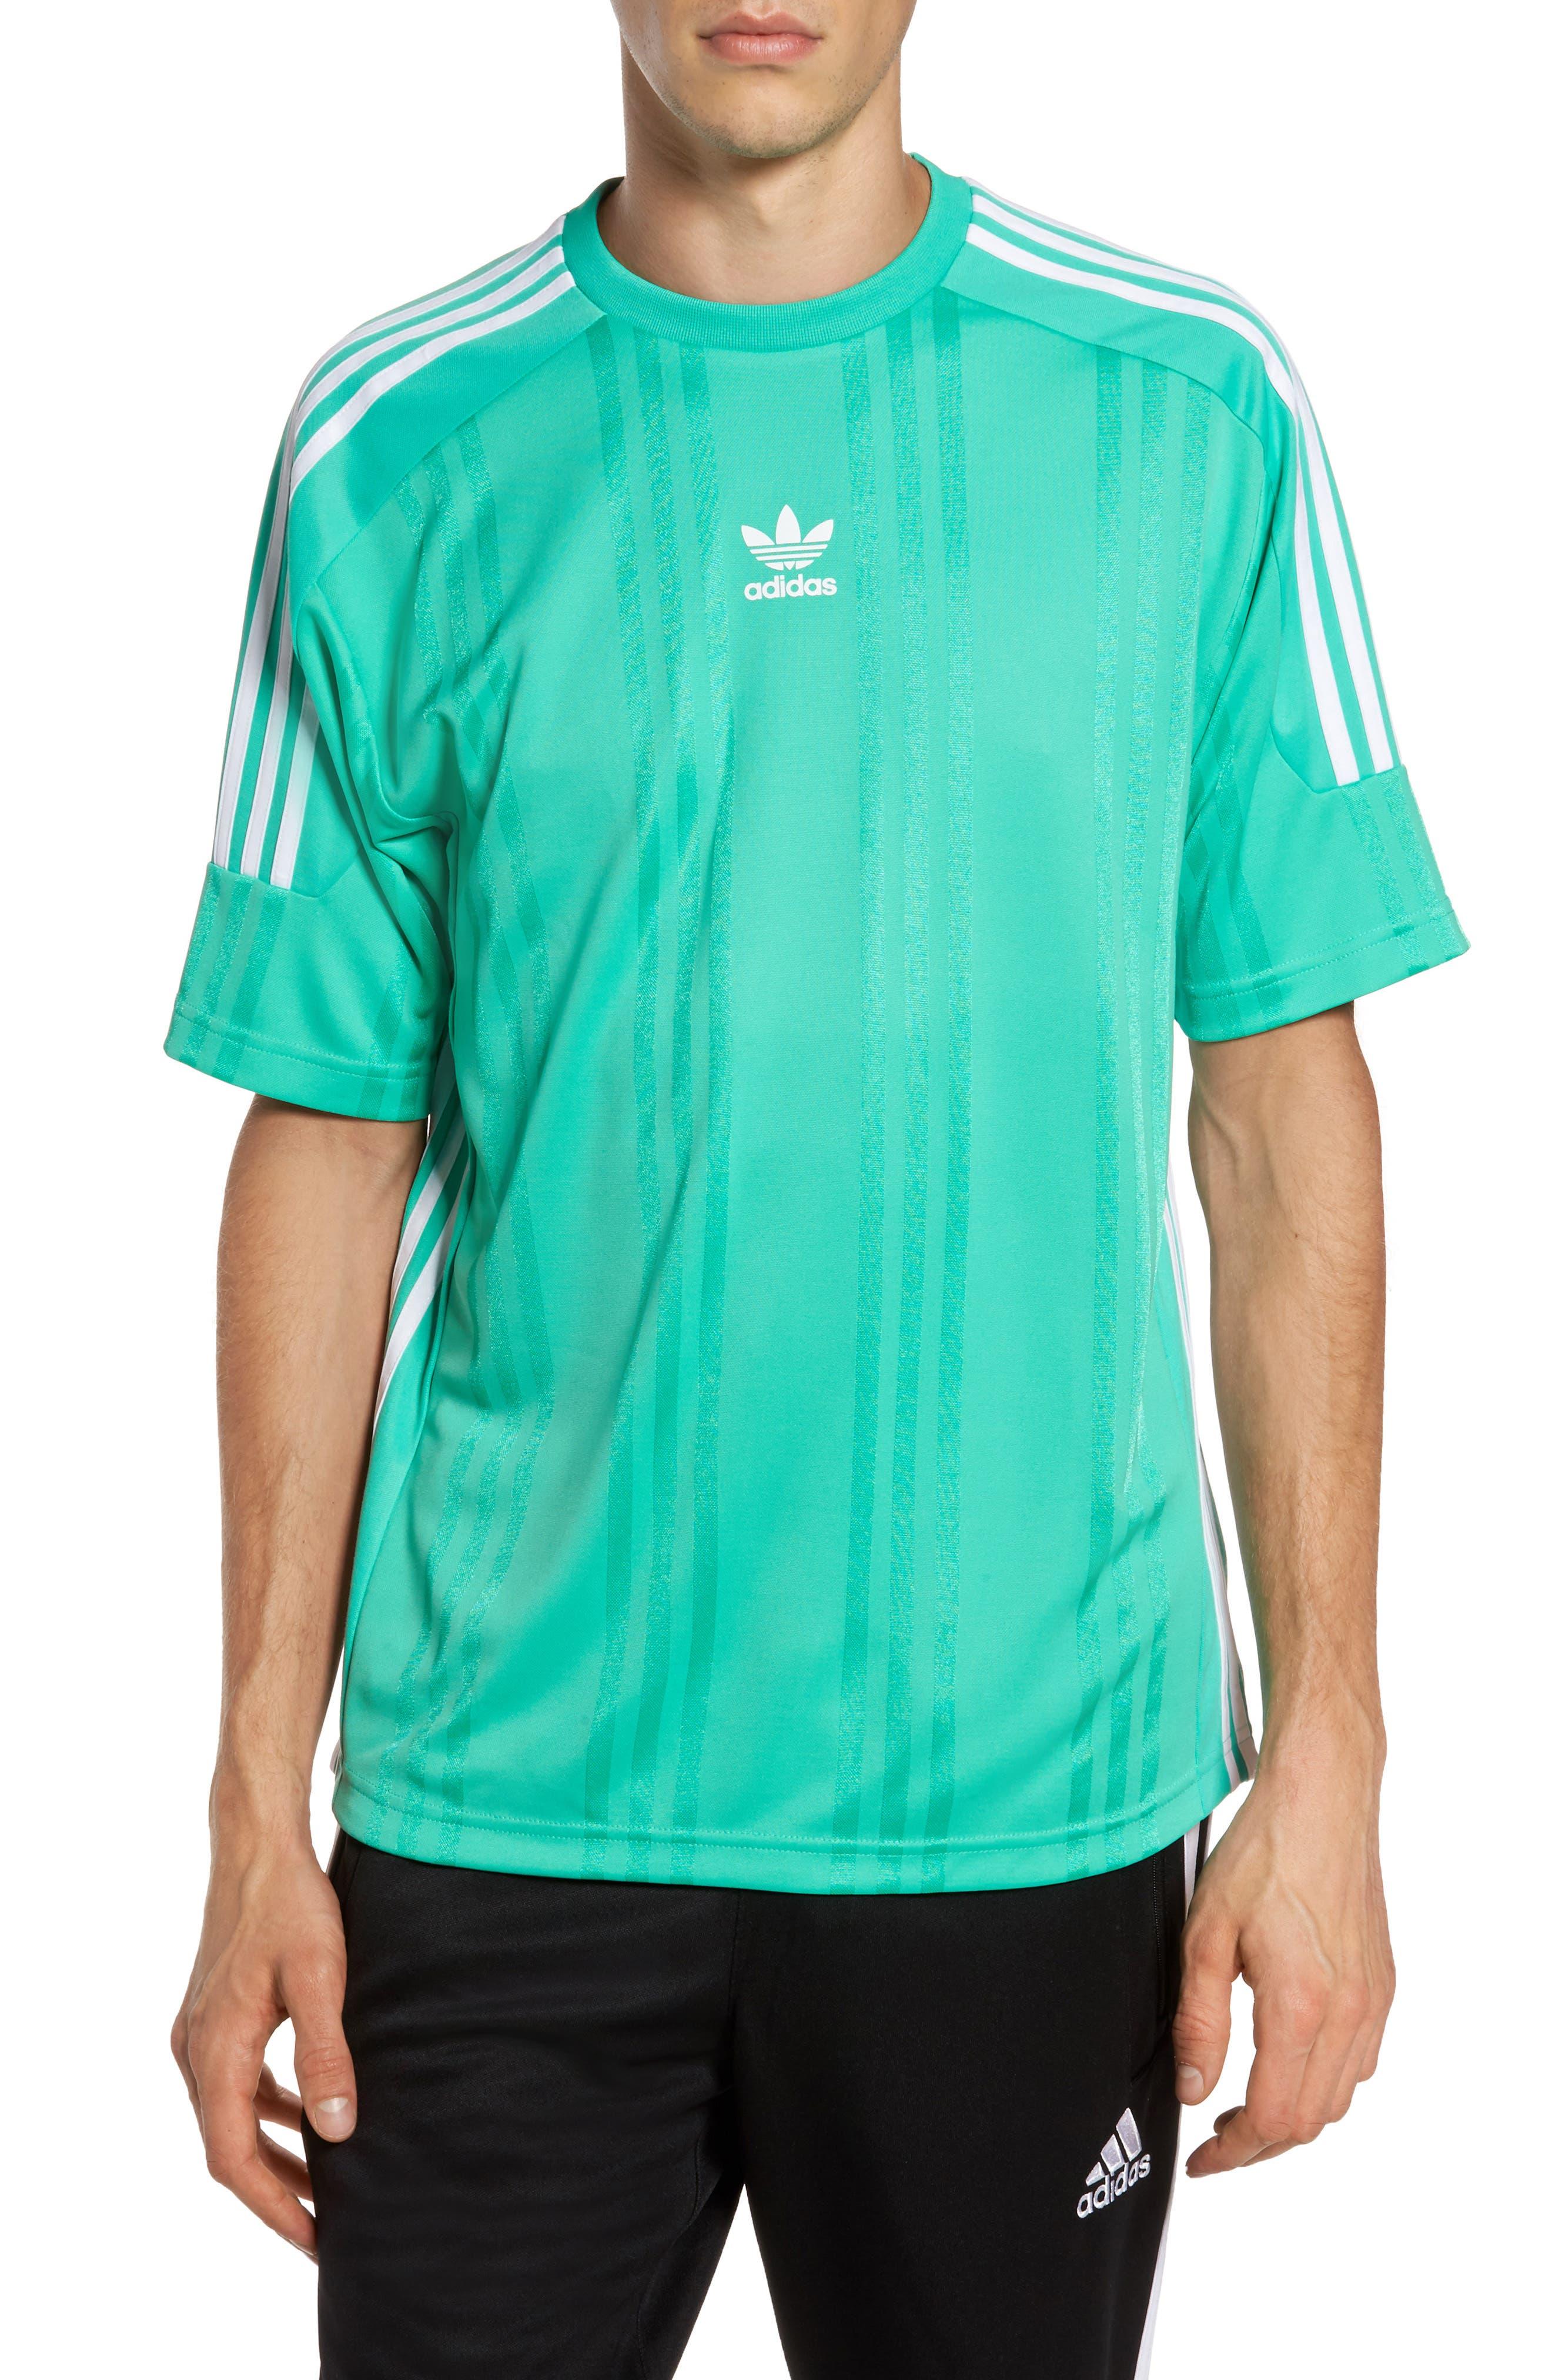 Main Image - adidas Originals Jacquard Stripe T-Shirt